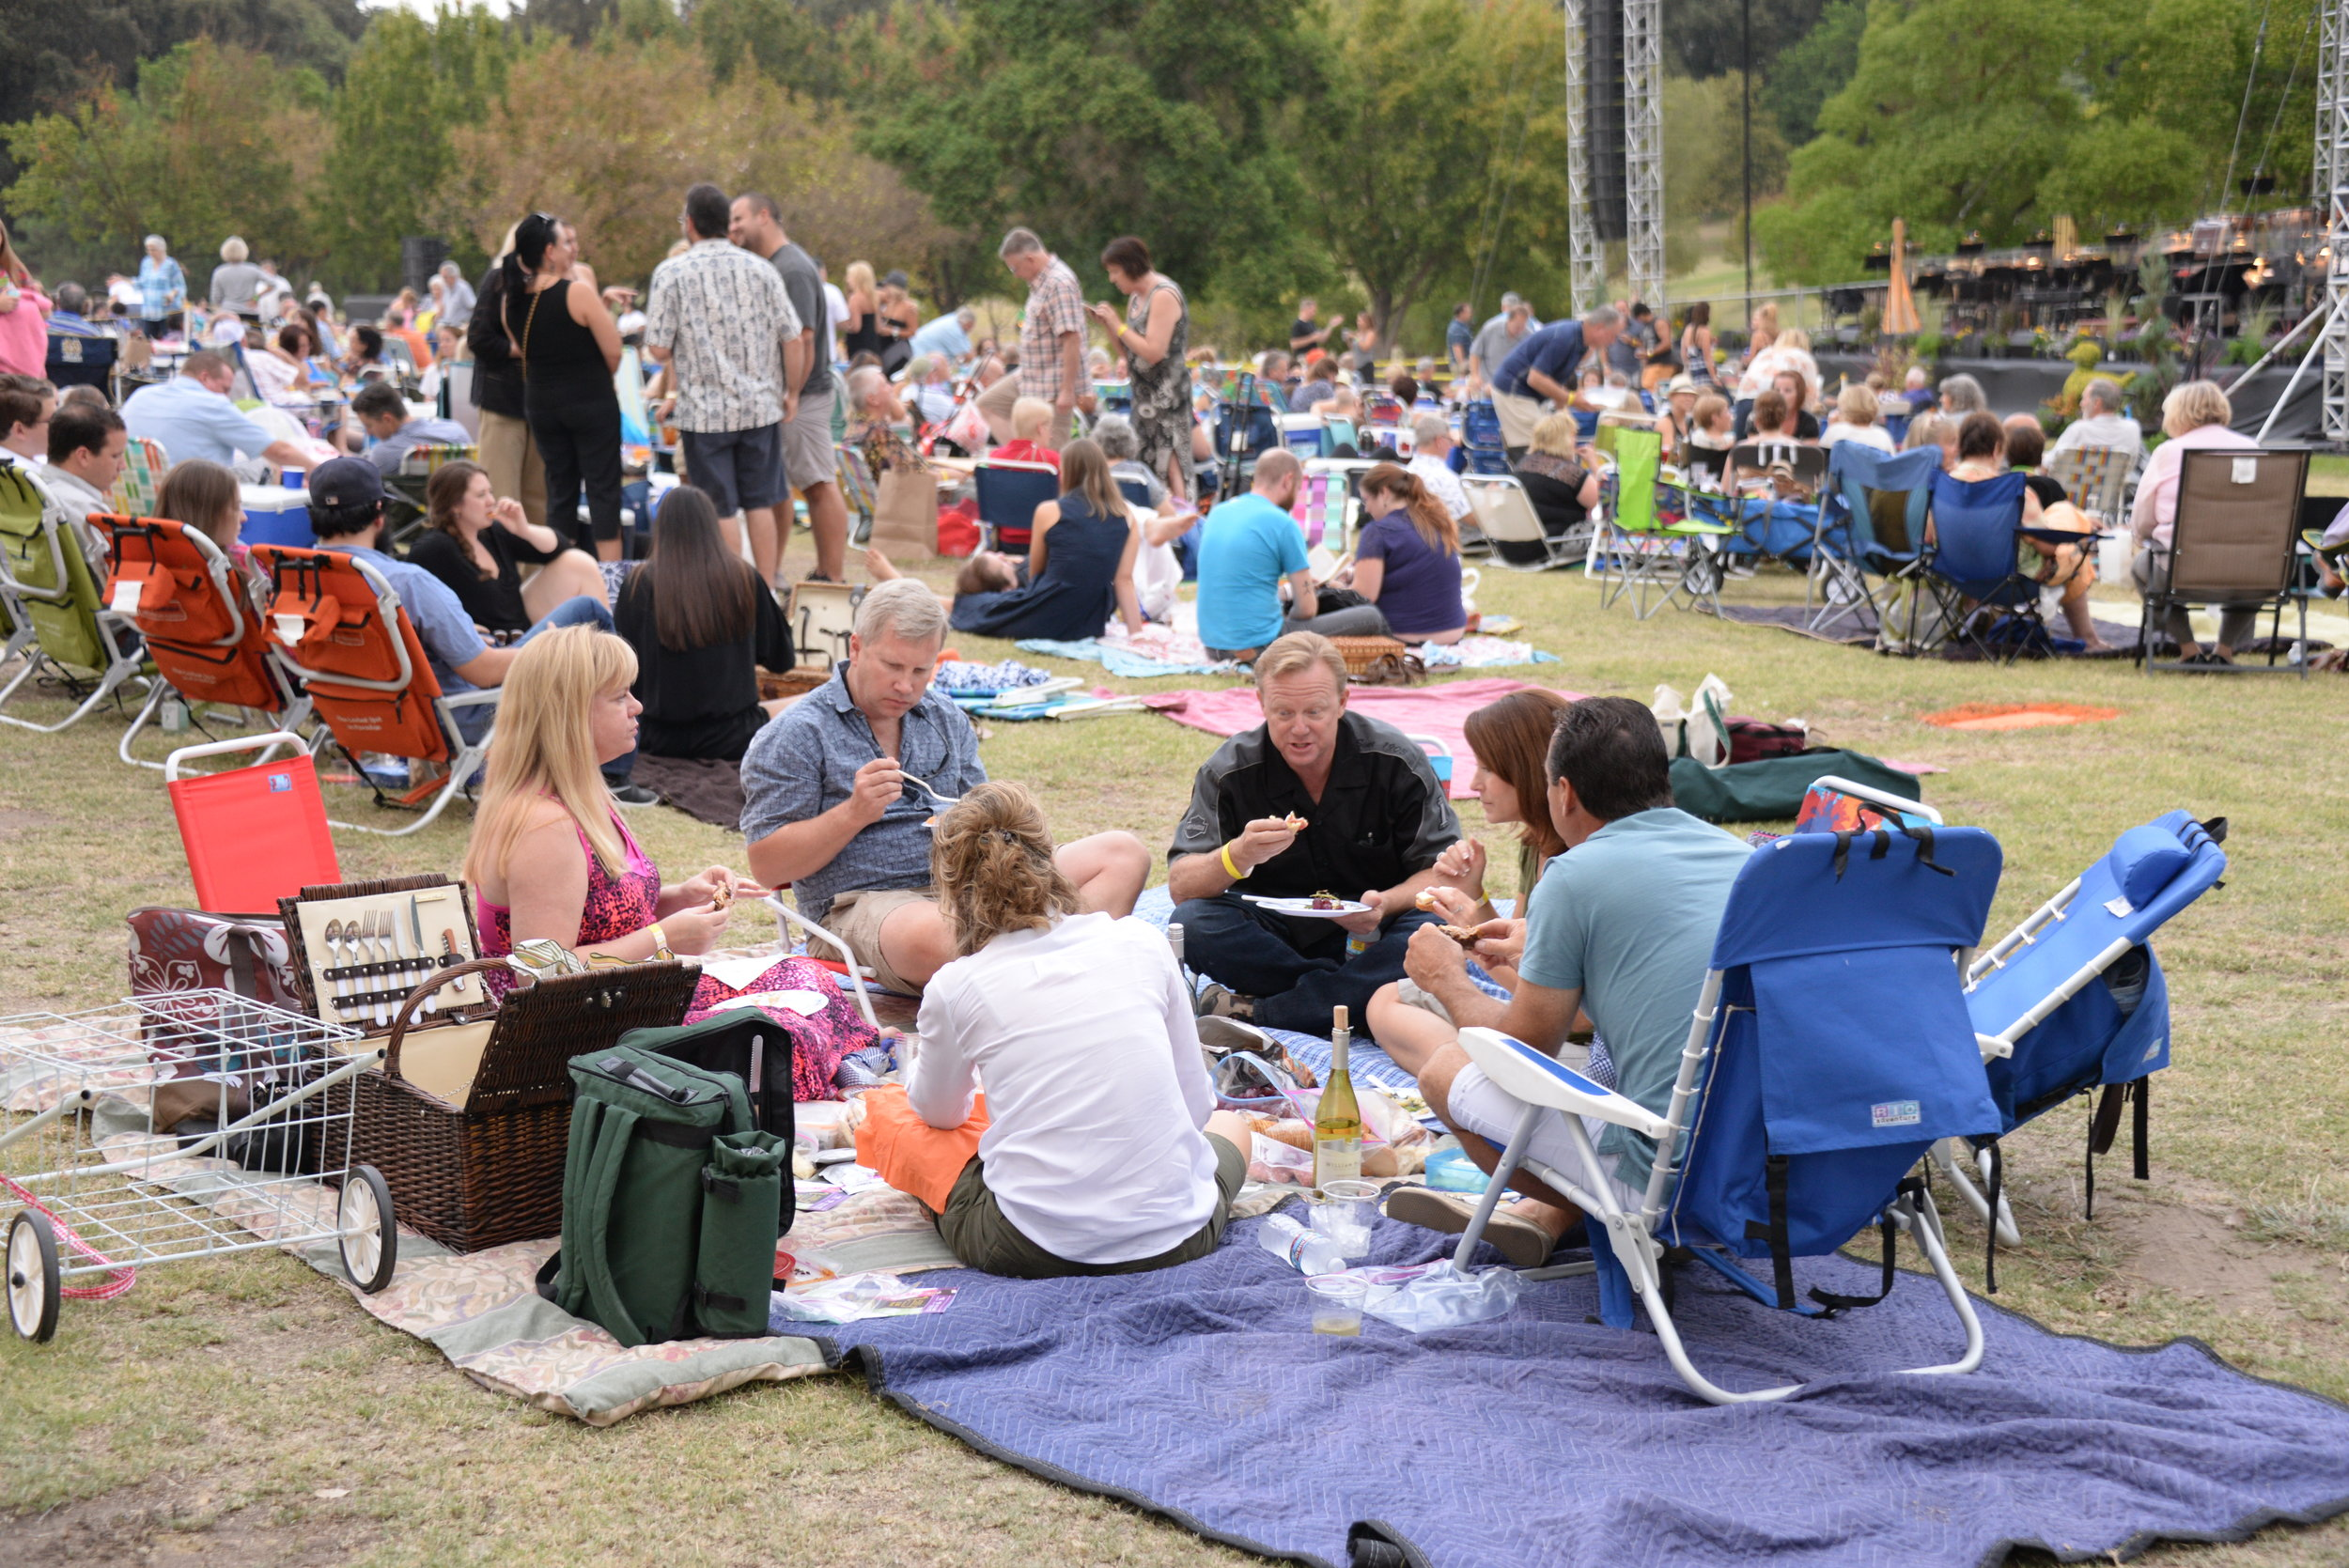 picnic at the pops  (1).JPG